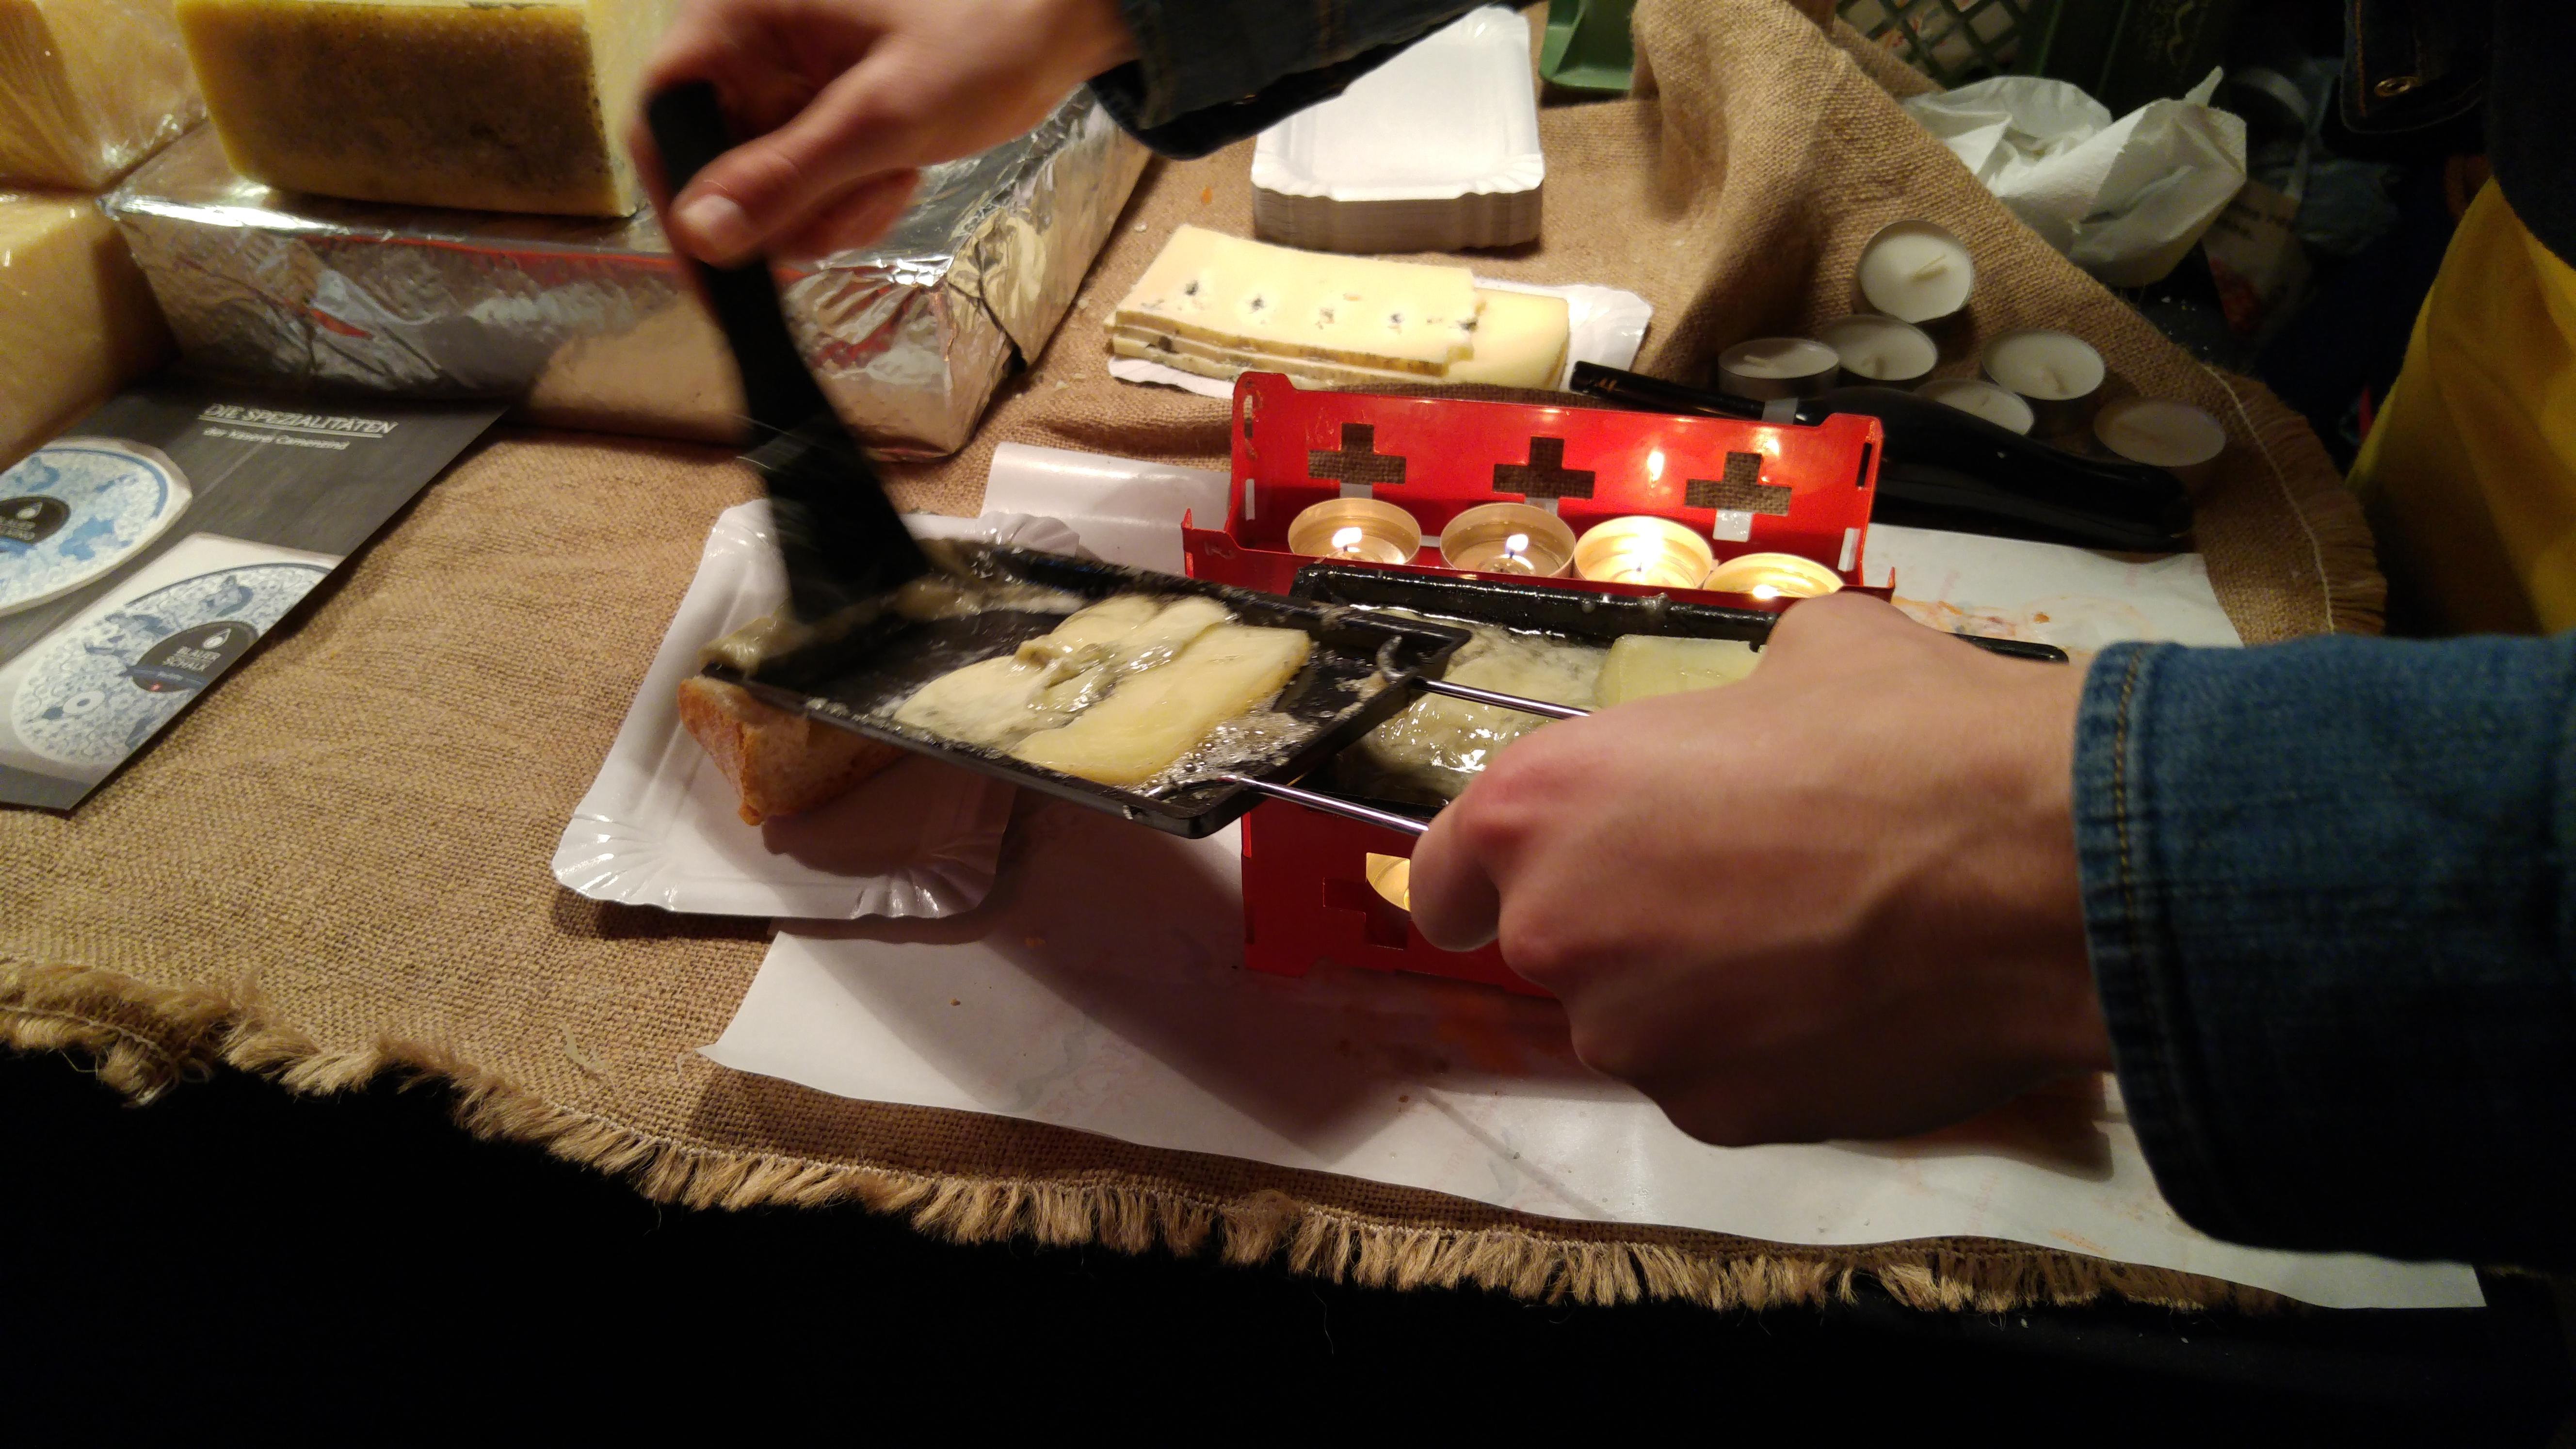 juustomark2